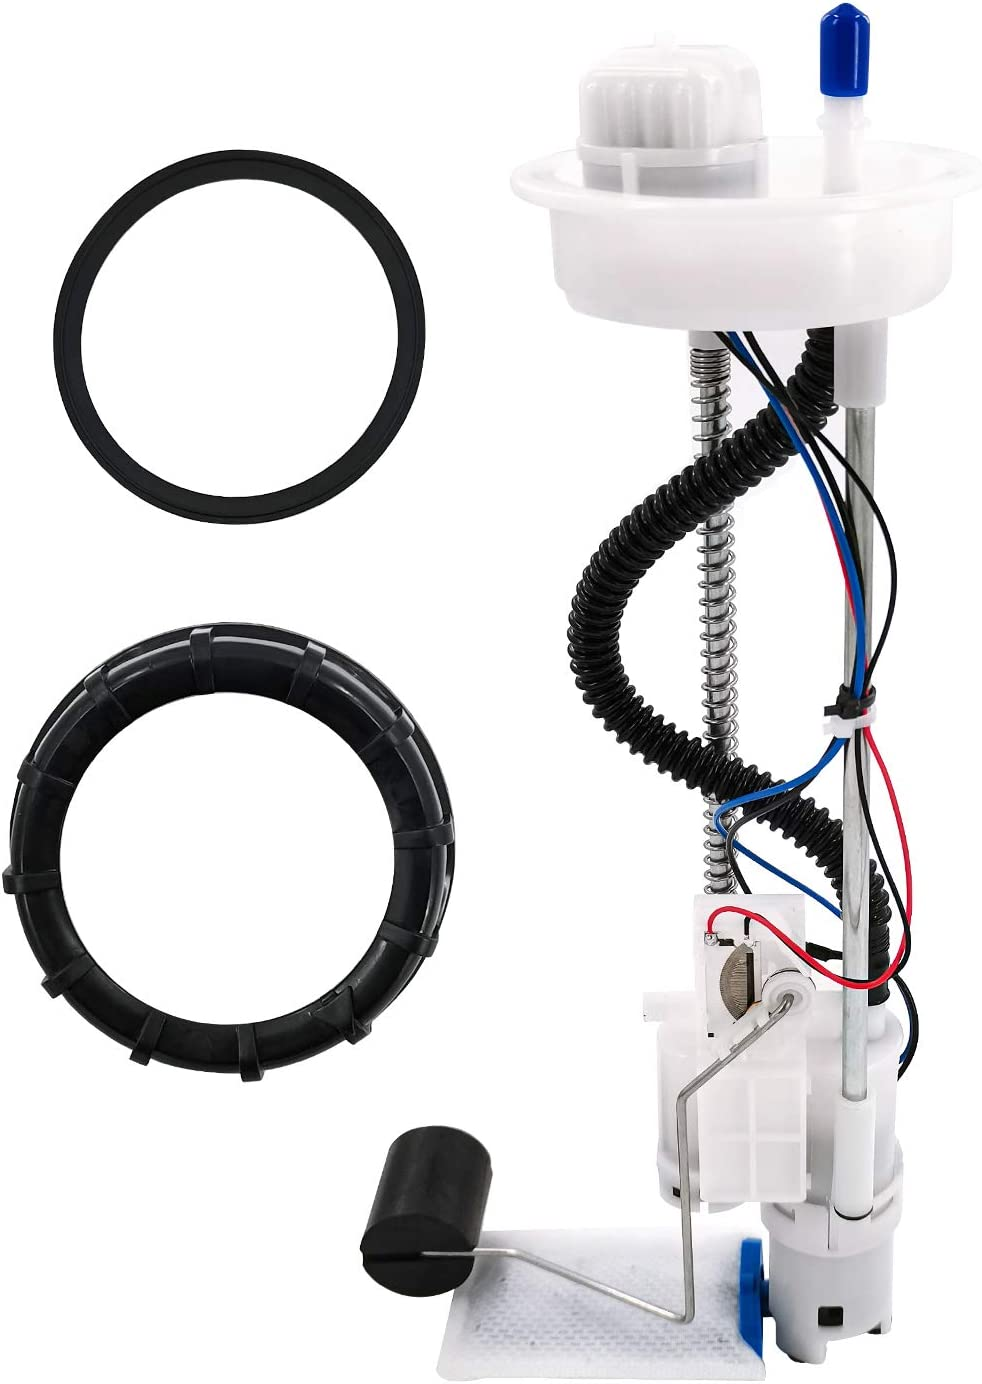 Fuel Pump ASSEMBLY Replacement for 2205469 2521389 Fit for Polaris Sportsman 570 850 EFI HD SP EPS TR Forest Sportsman 450 HO Scrambler 1000 XP MD EU 2014 2015 2016 2207670